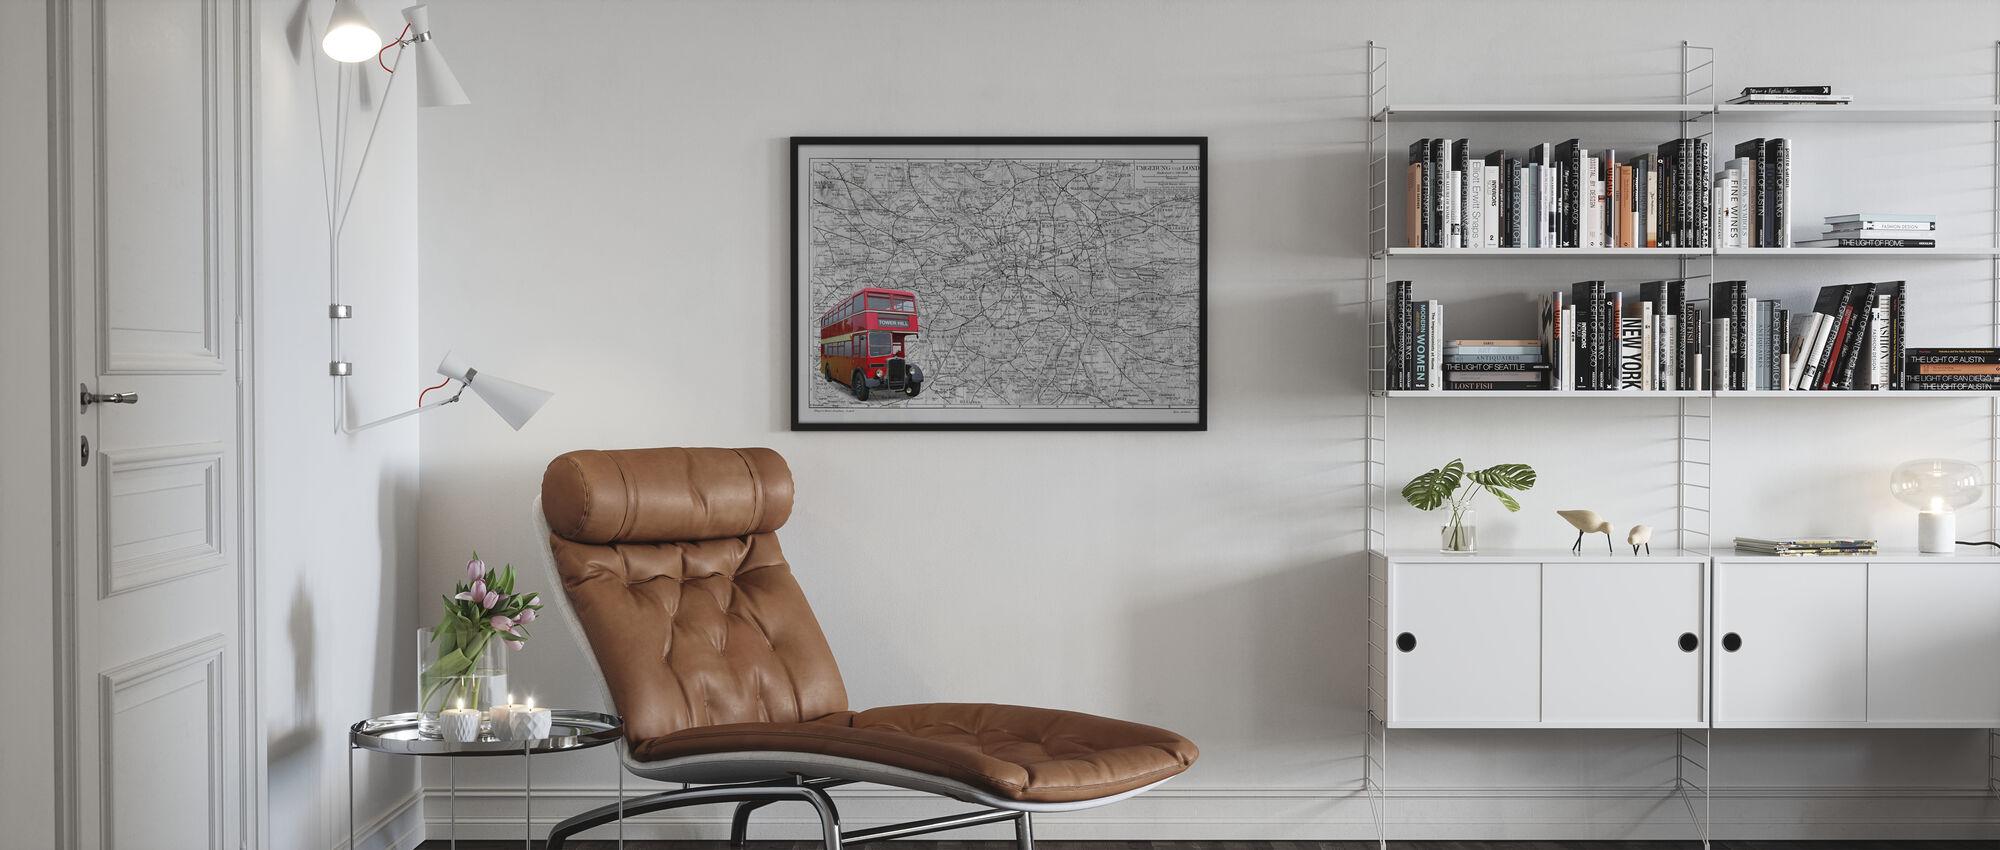 London Map with Bus - Colorsplash - Framed print - Living Room